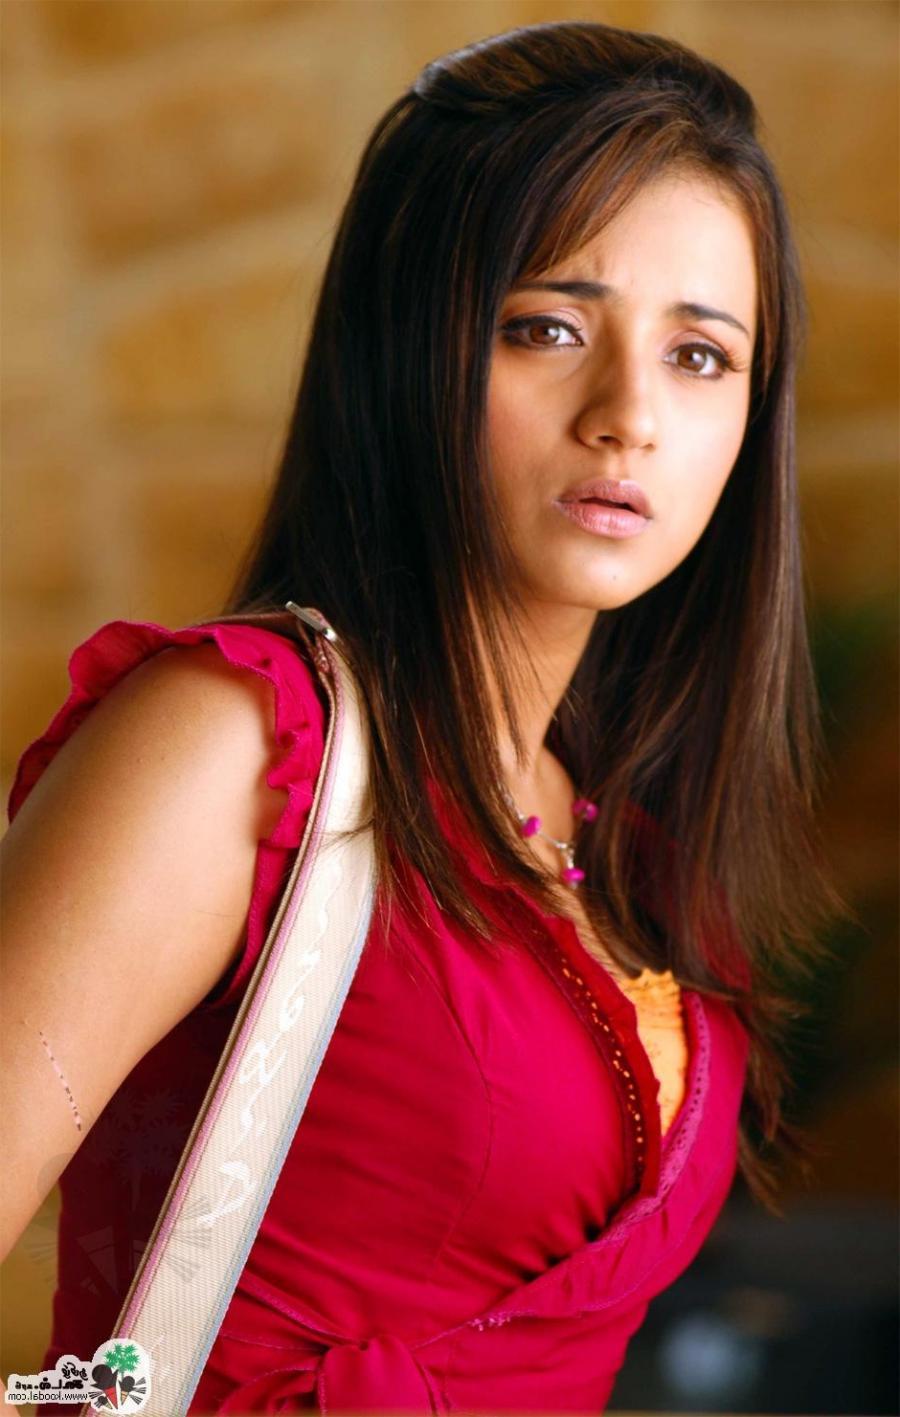 Please, Tamil girl trisha bathroom video not happens))))